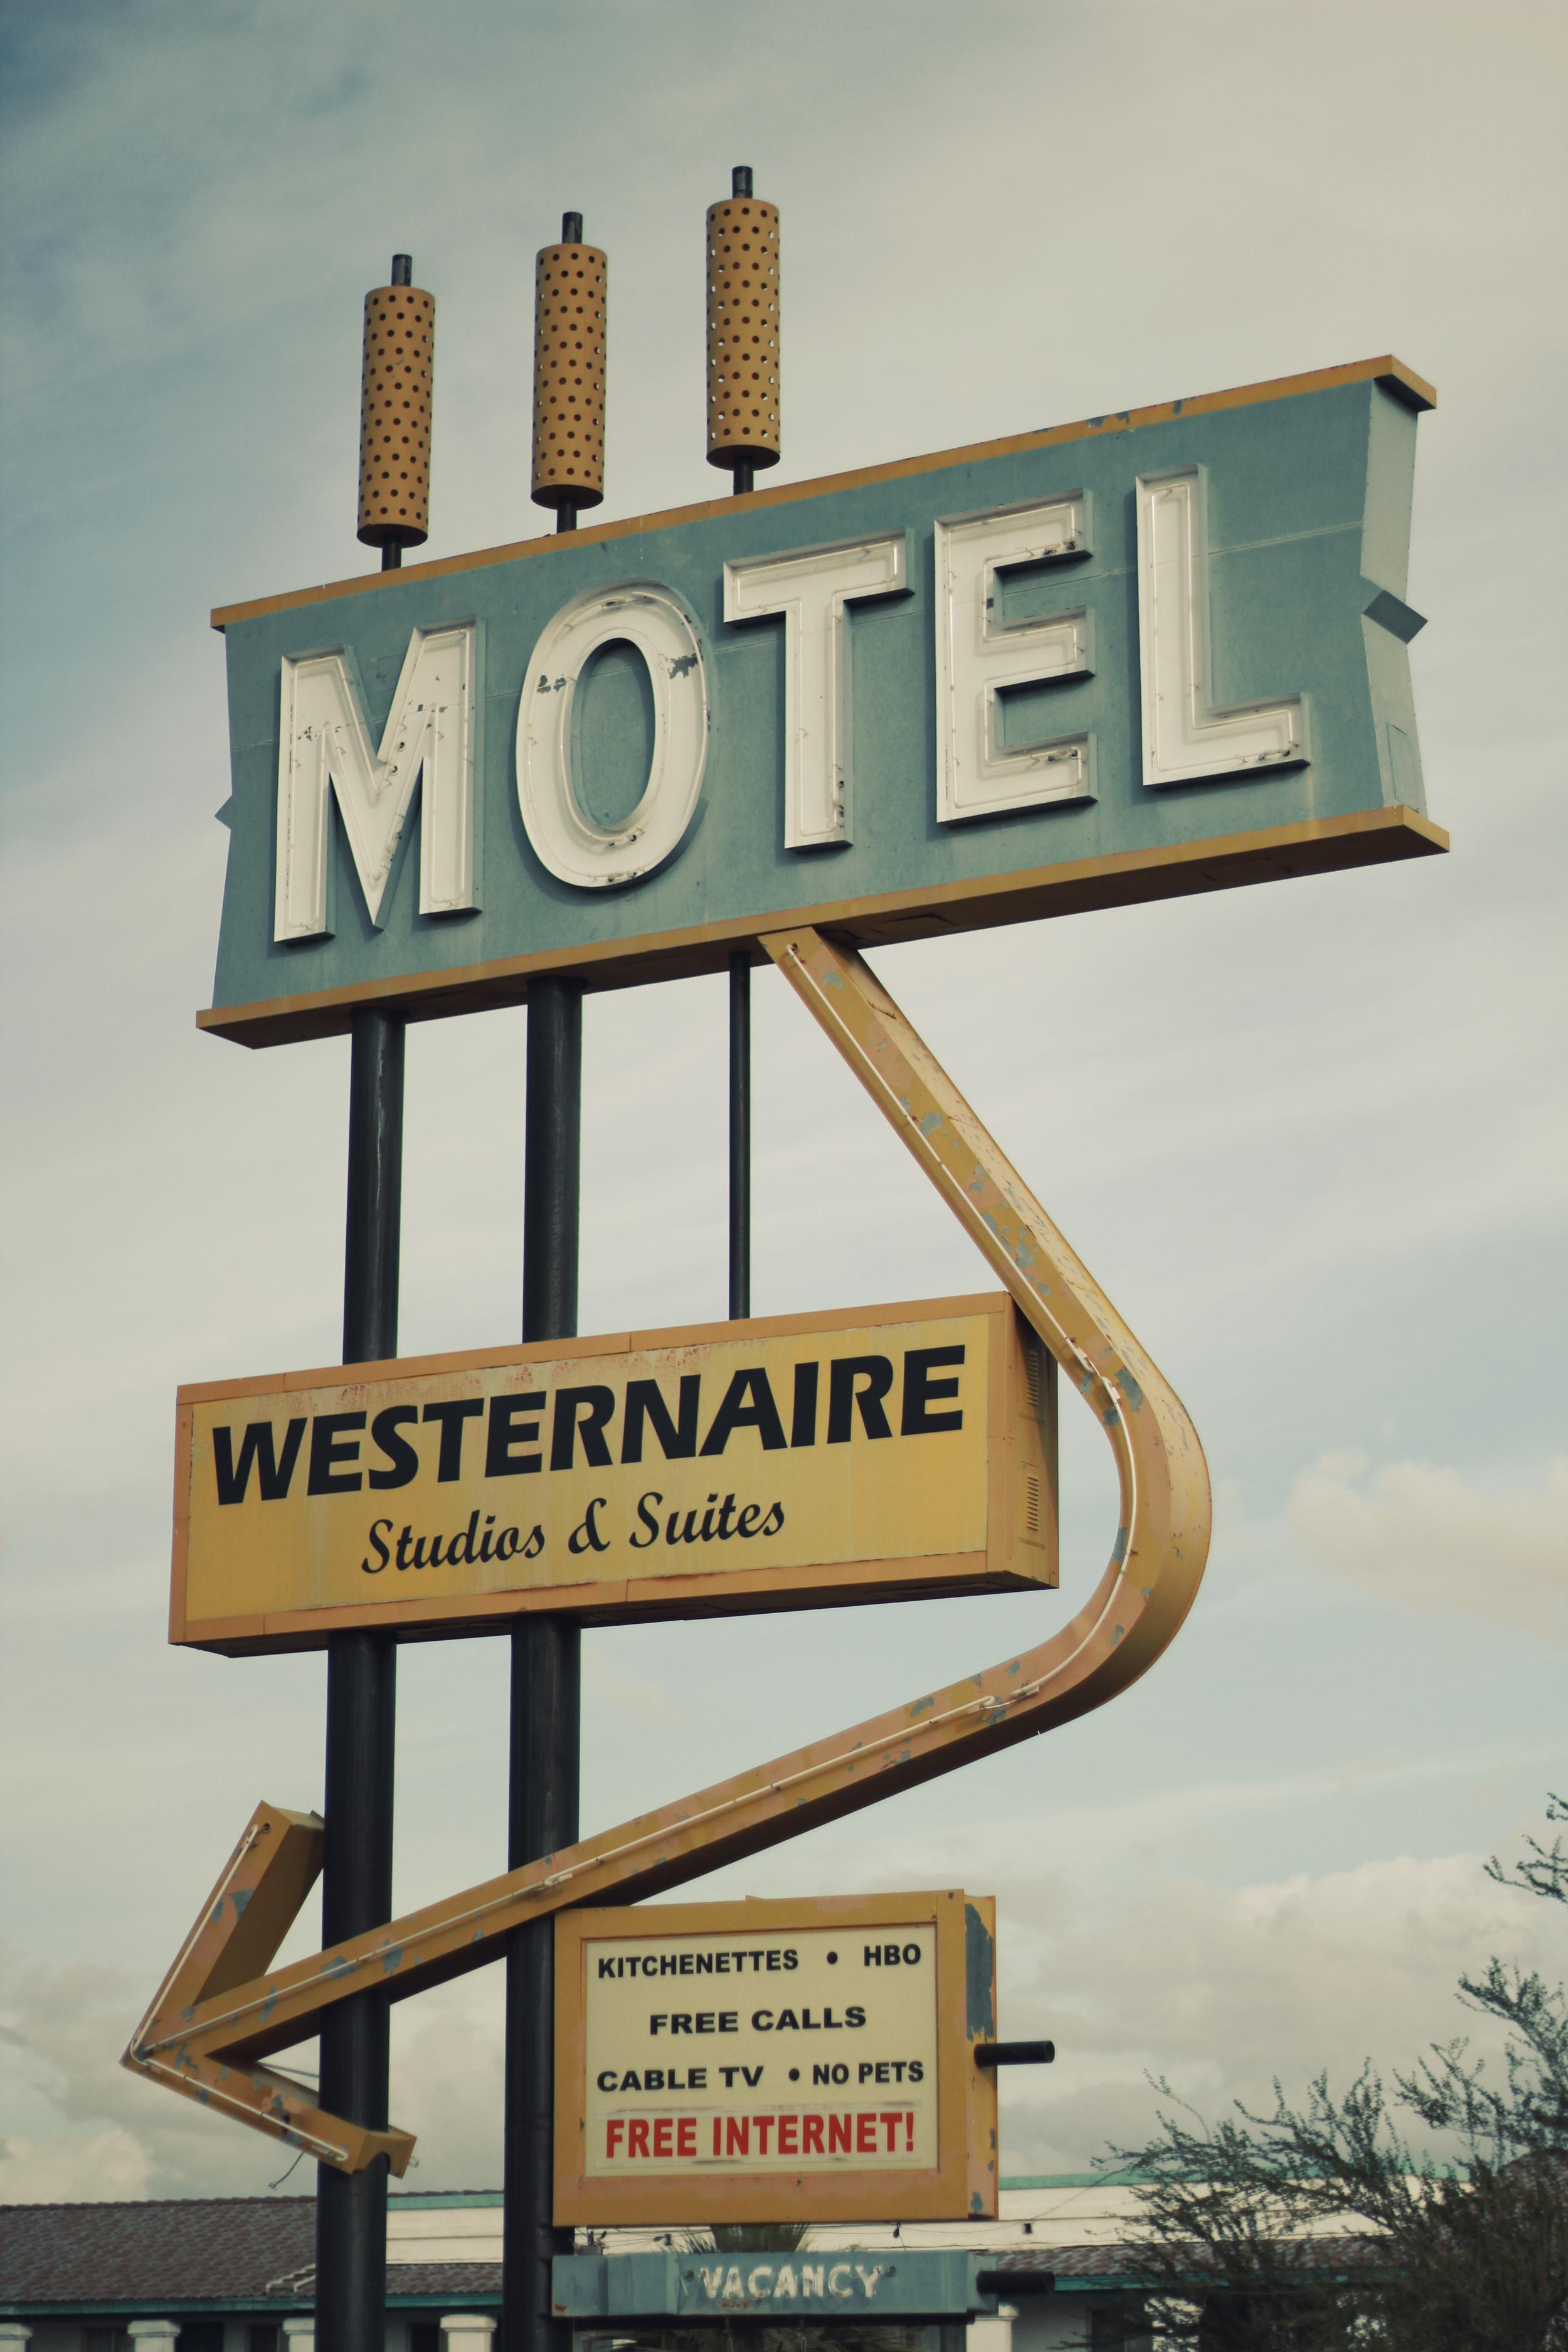 Westernaire Motel.jpg